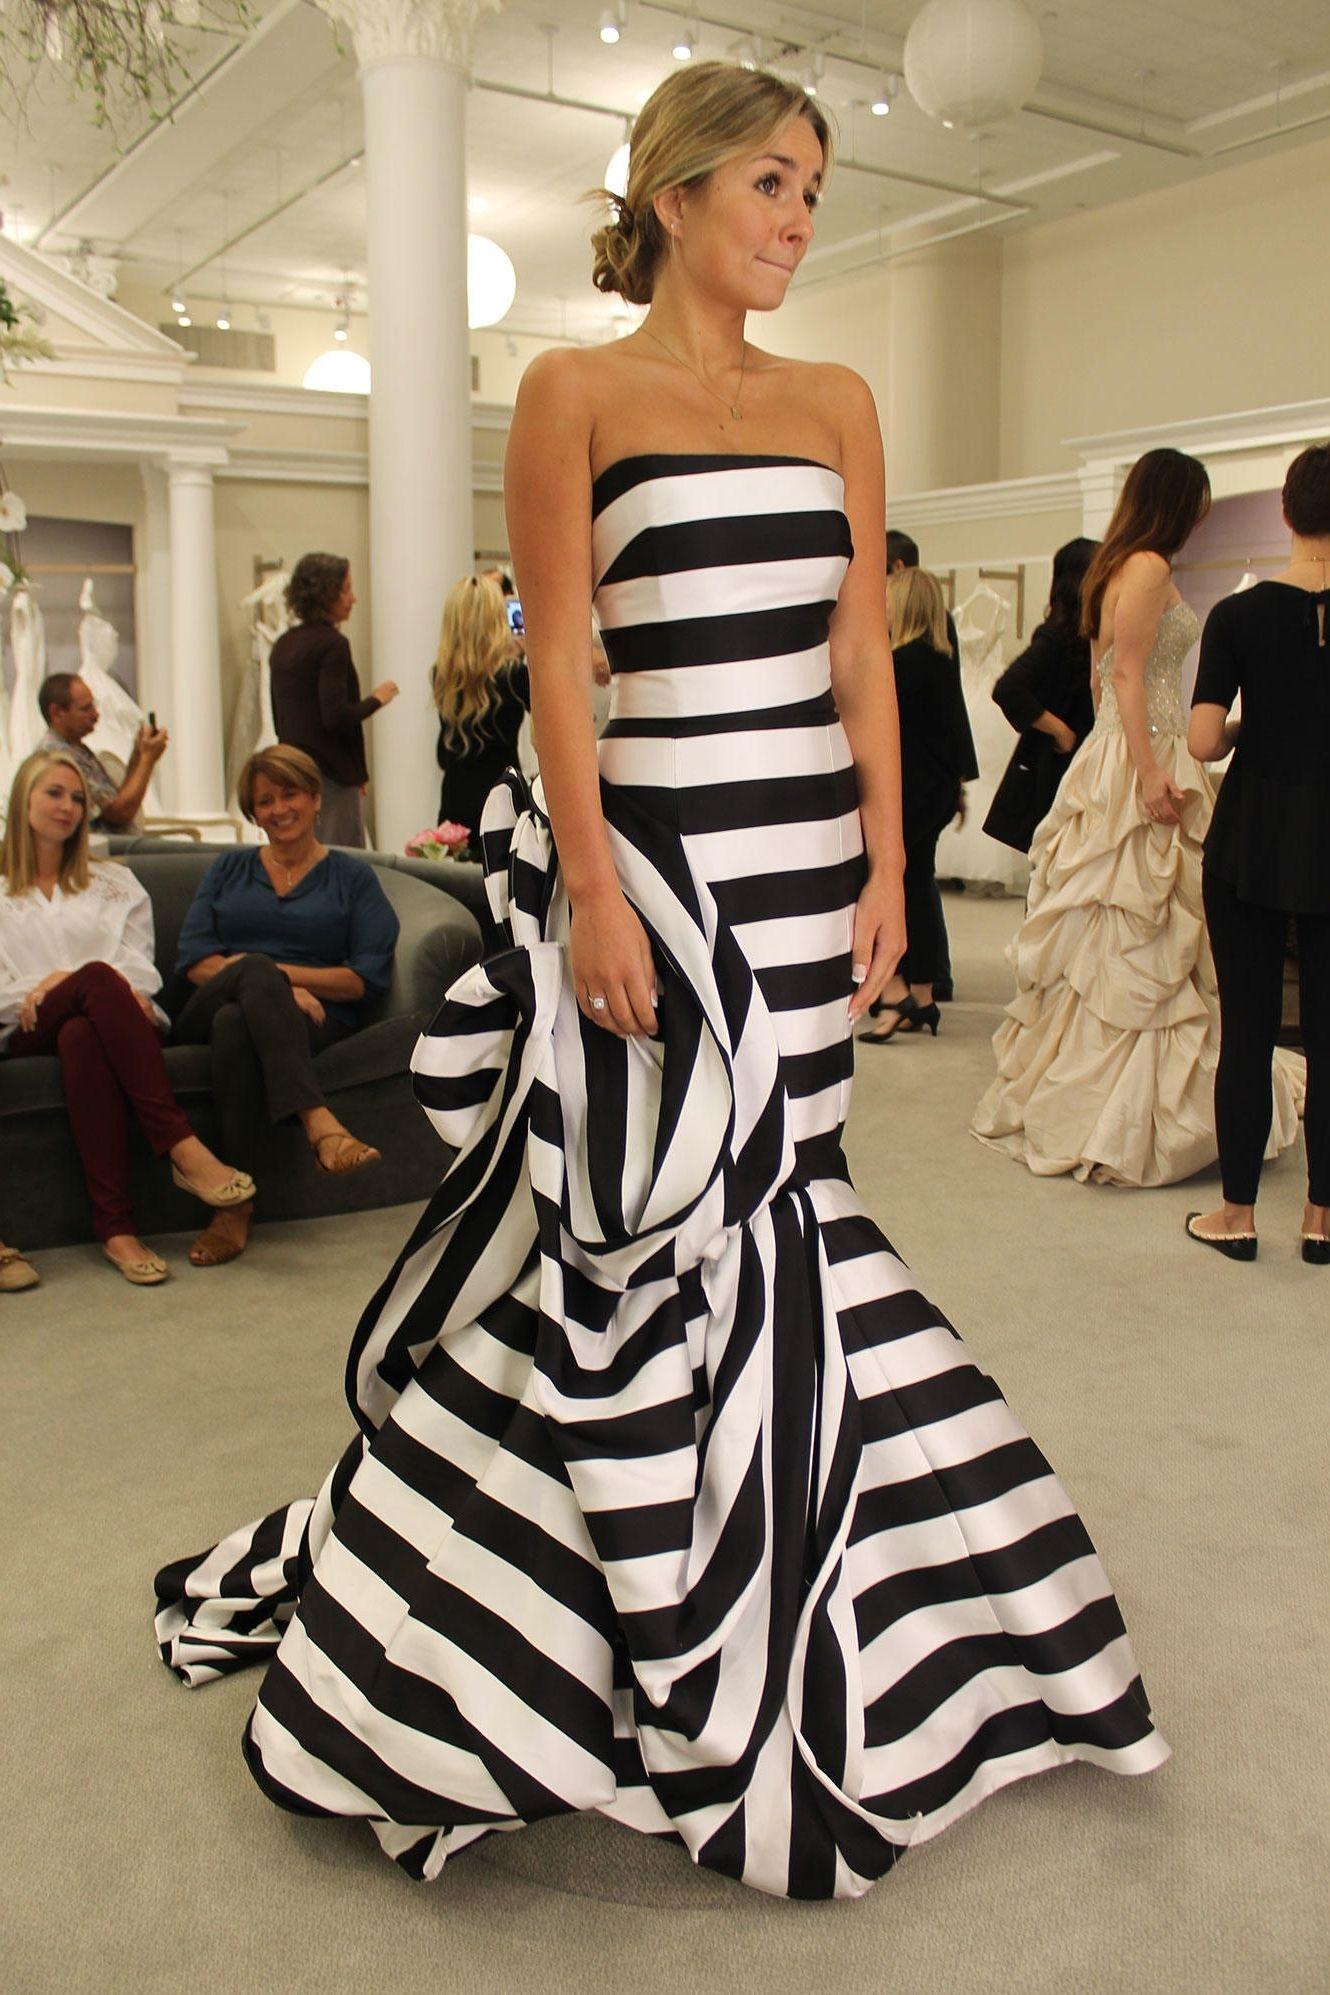 294e9ad58950 David S Bridal Black And White Striped Dress